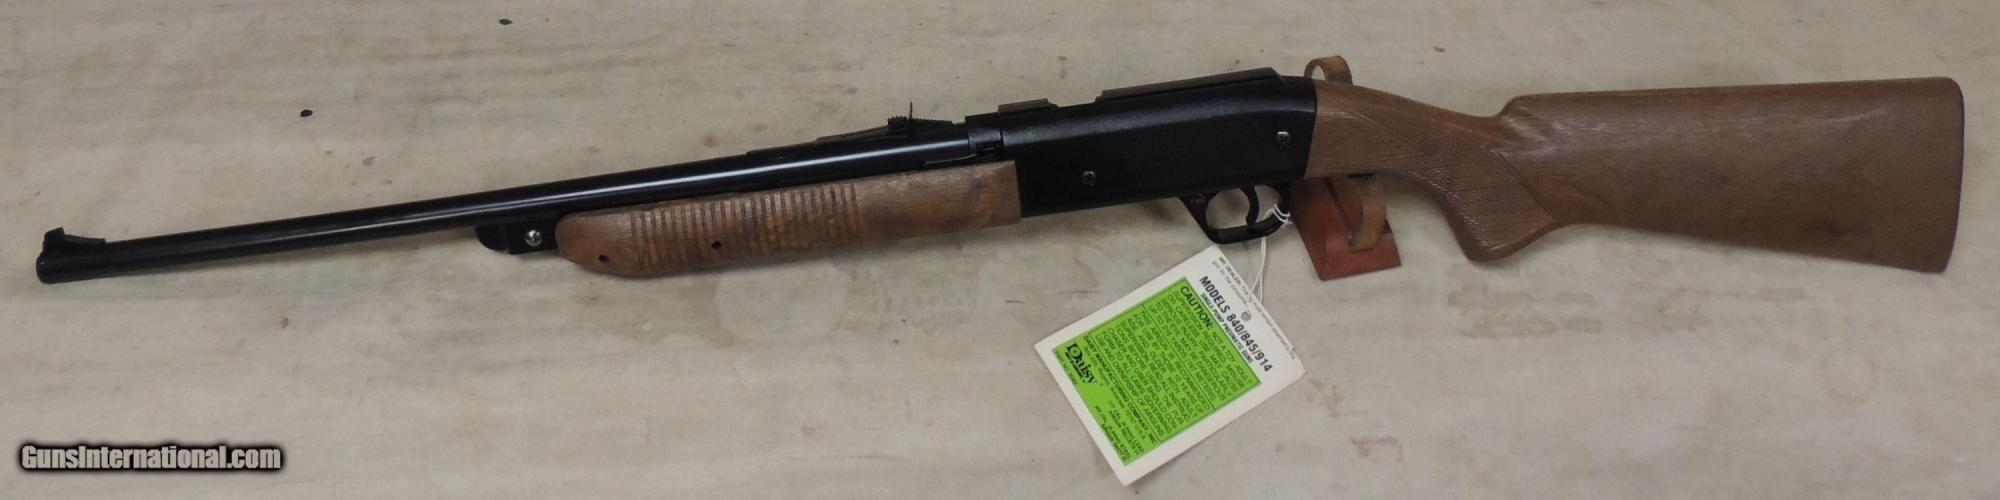 hight resolution of daisy model 840 quail limited single pump 1 77 caliber pneumatic bb gun nib 1